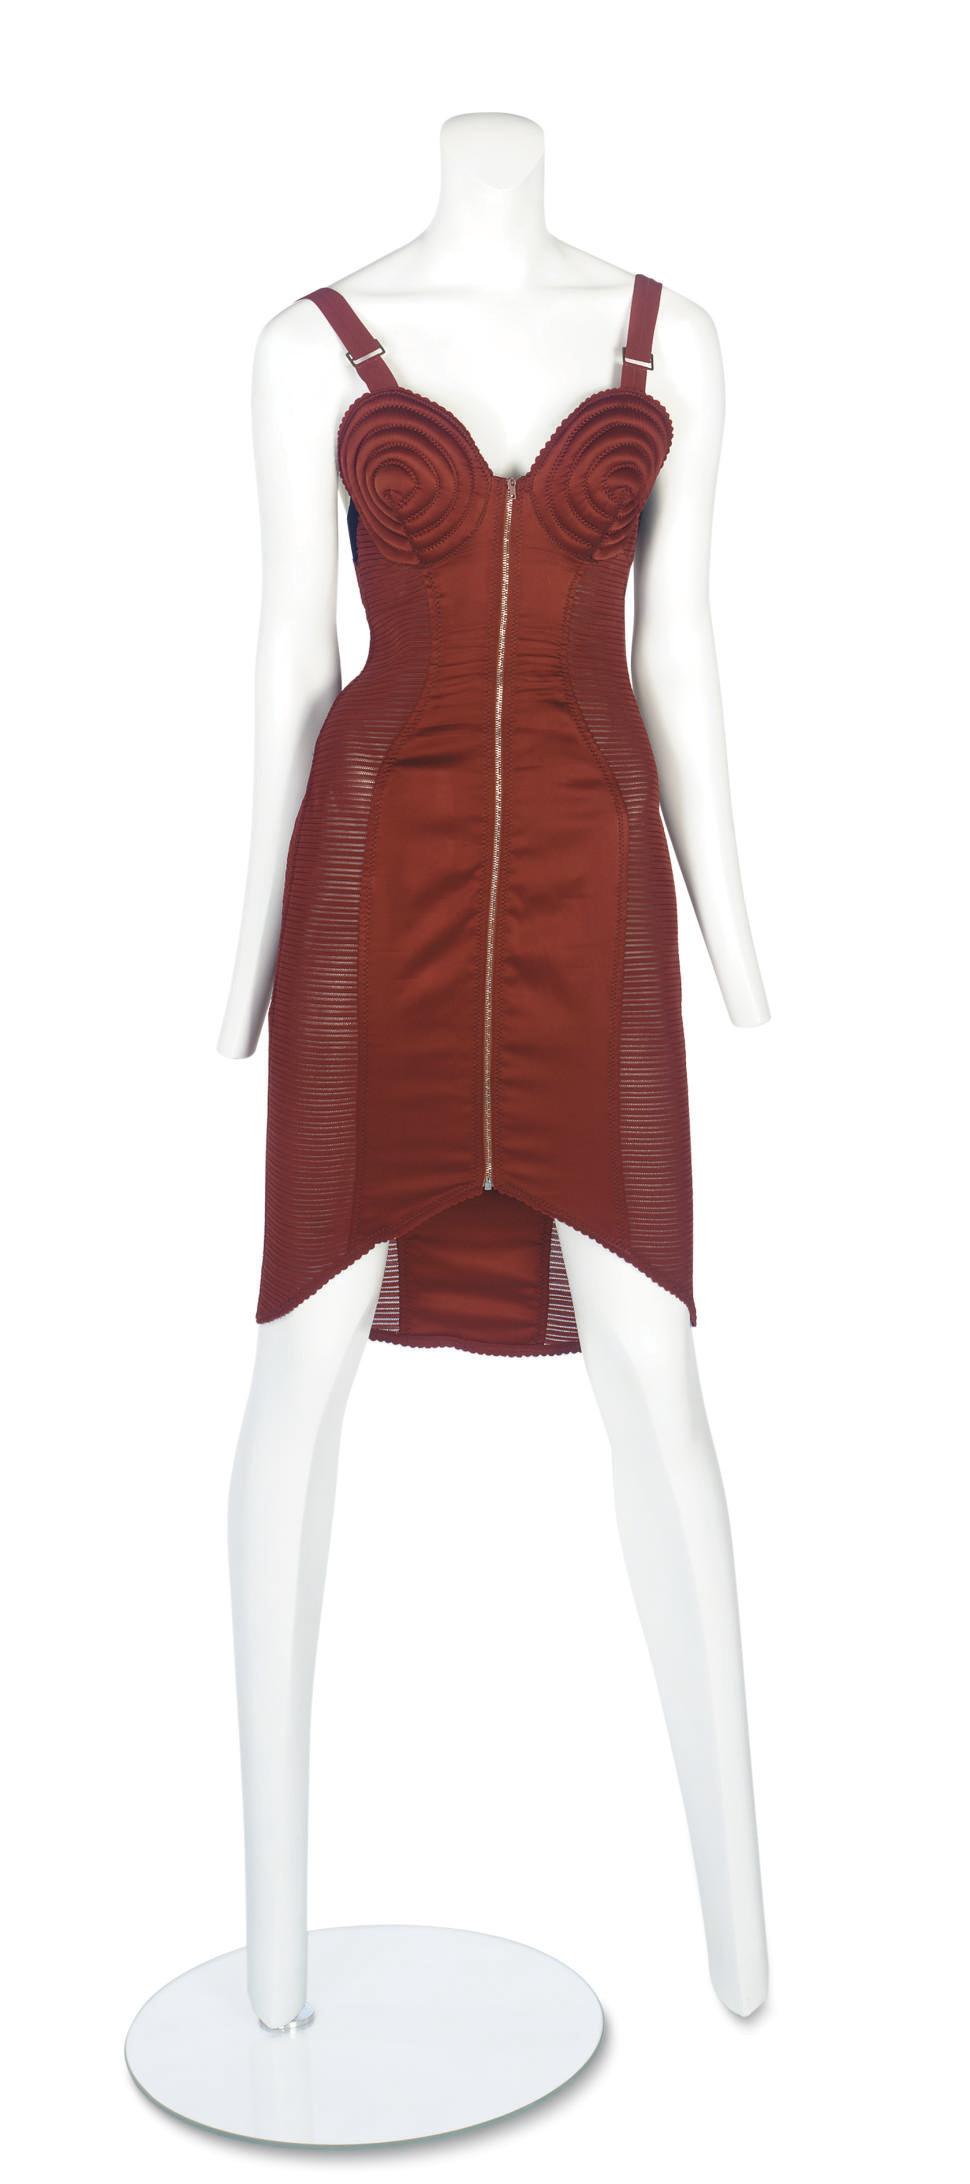 JEAN-PAUL GAULTIER (B.1952) A RARE 'CORSET' COCKTAIL DRESS